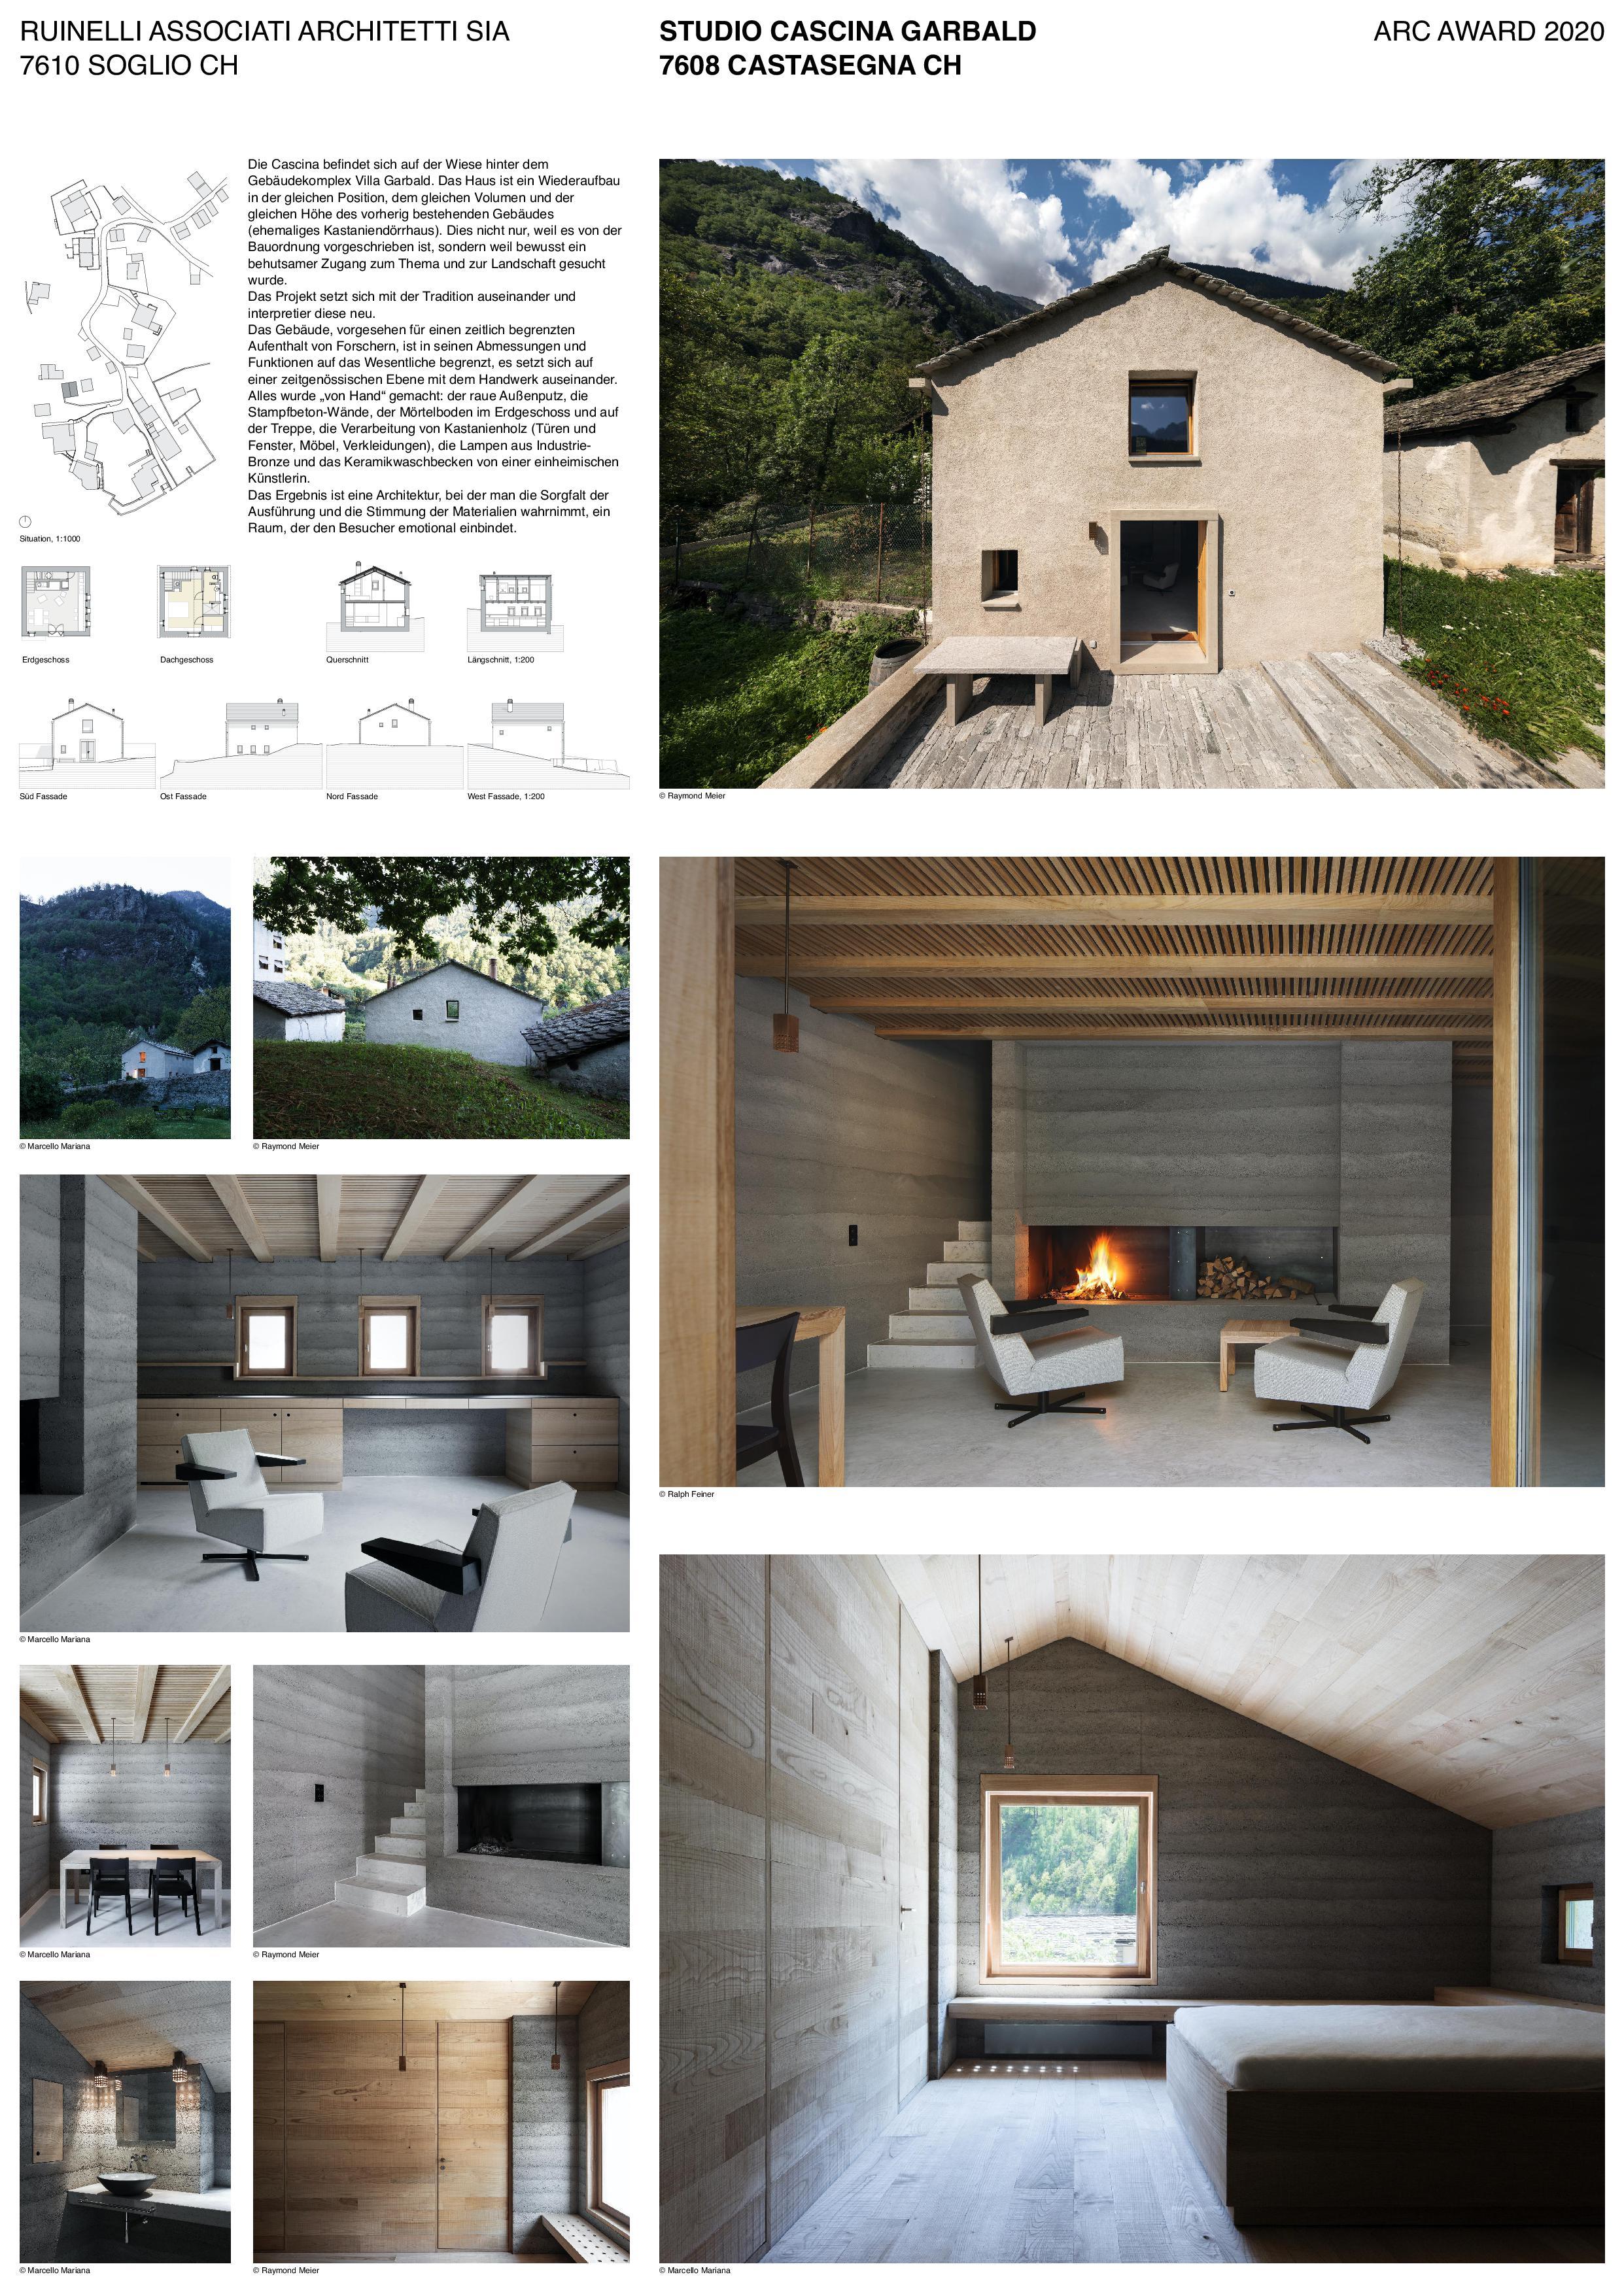 Plakat Studio Cascina Garbald (scientist in residence) von Architetti SIA<br/>